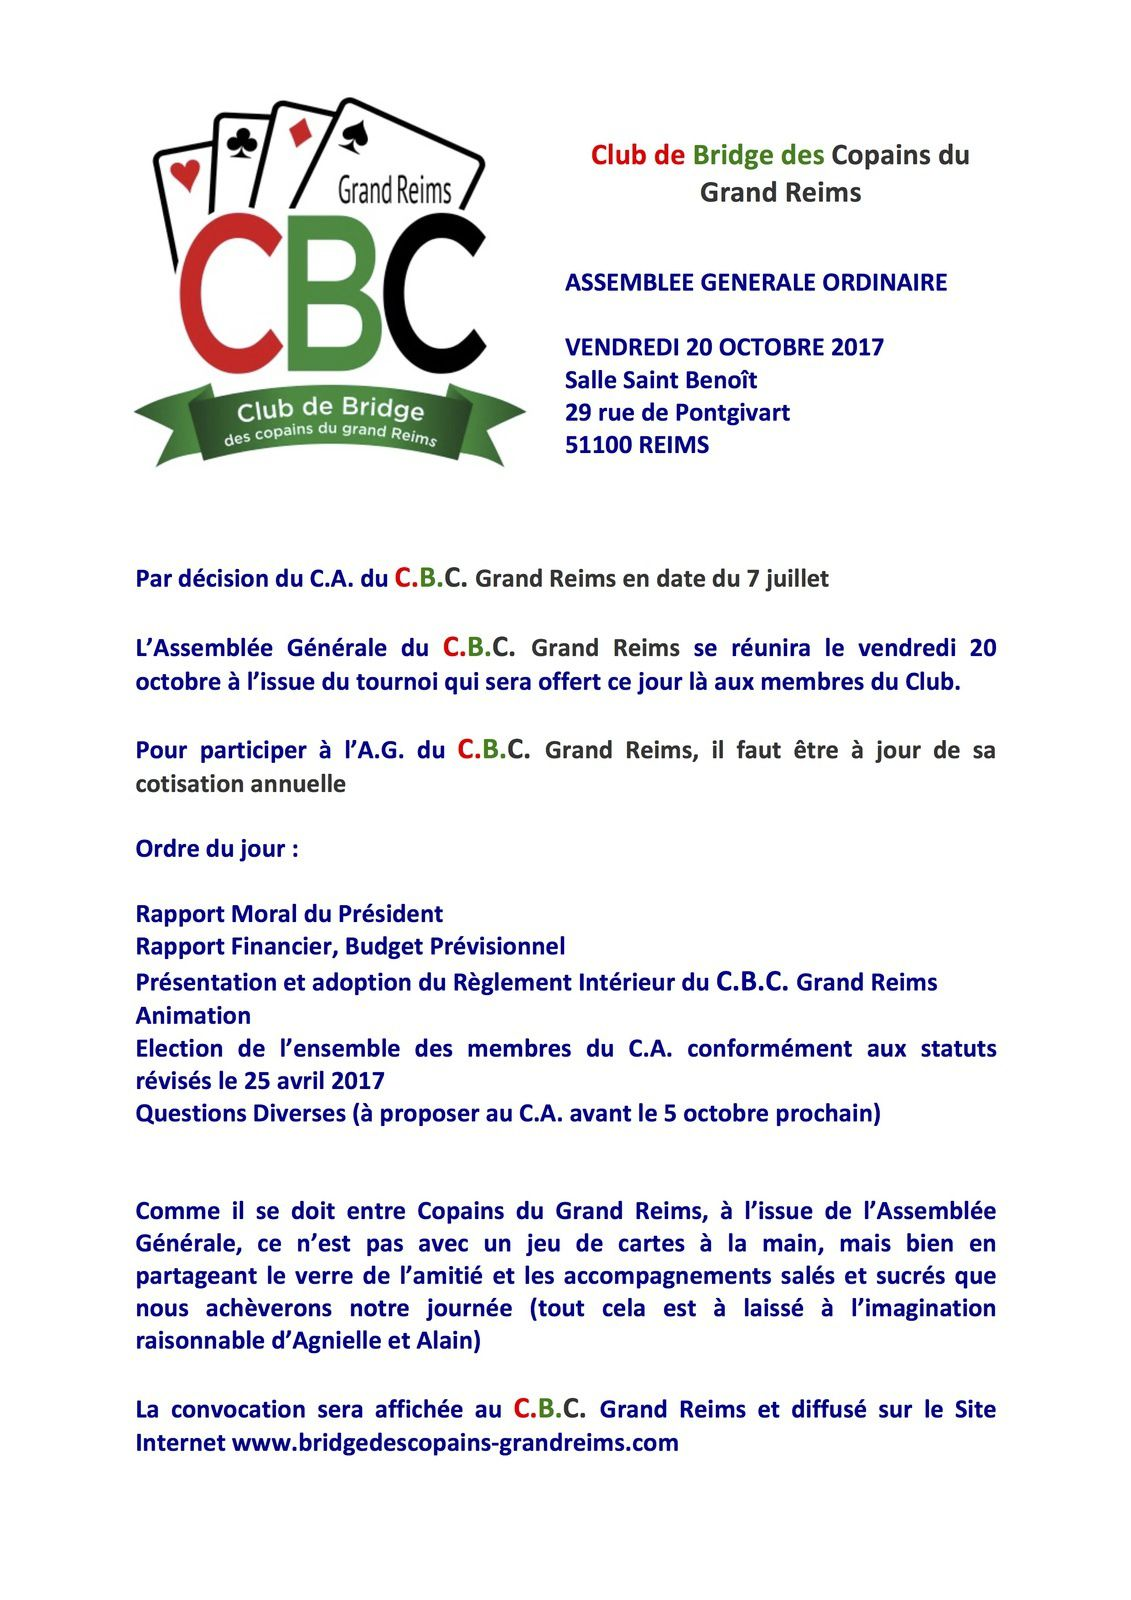 CONVOCATION ASSEMBLEE GENERALE DU VENDREDI 20 OCTOBRE 2017